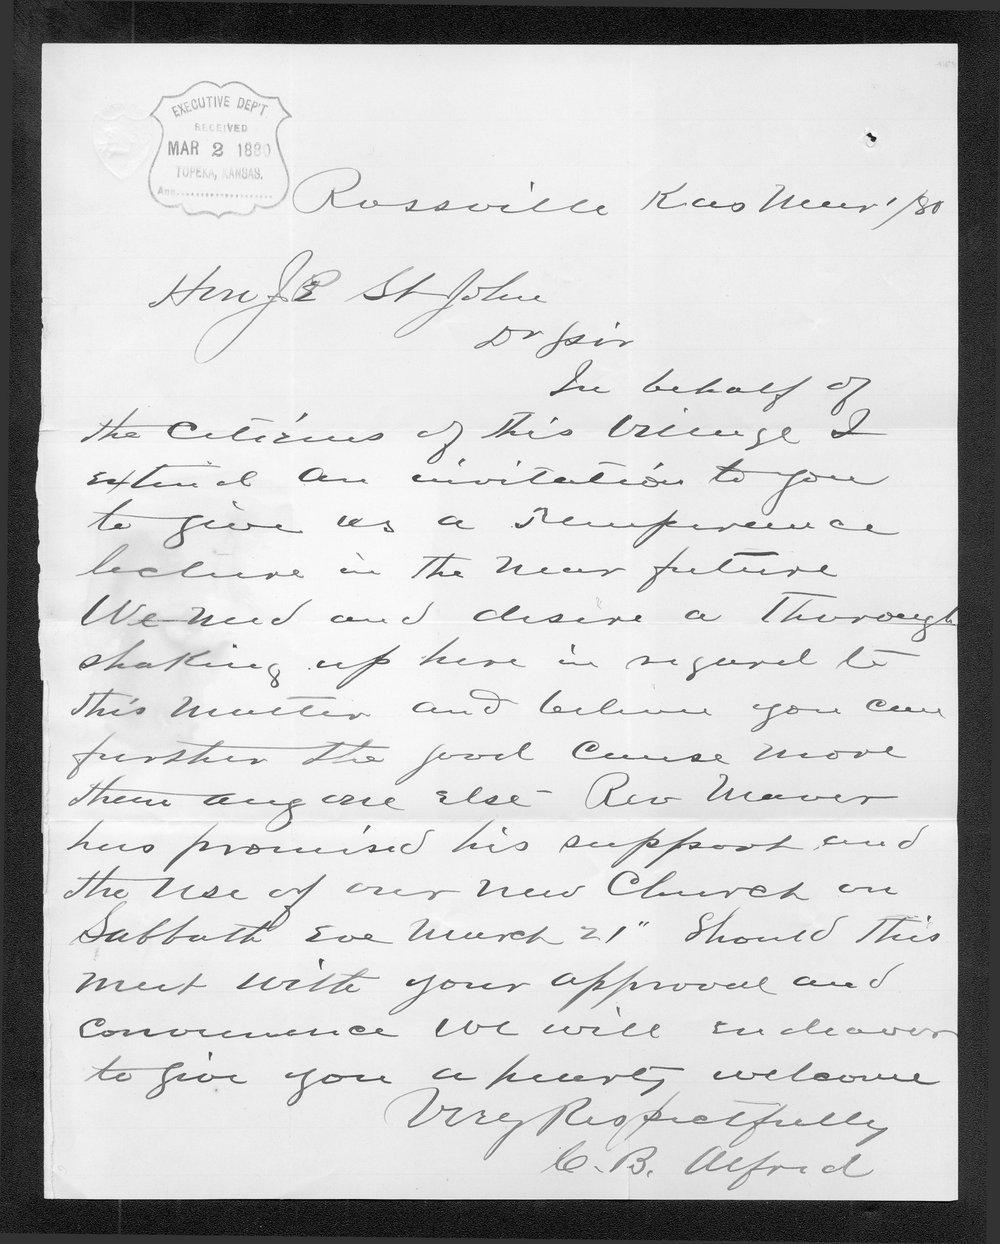 C. B. Alford to Governor John St. John